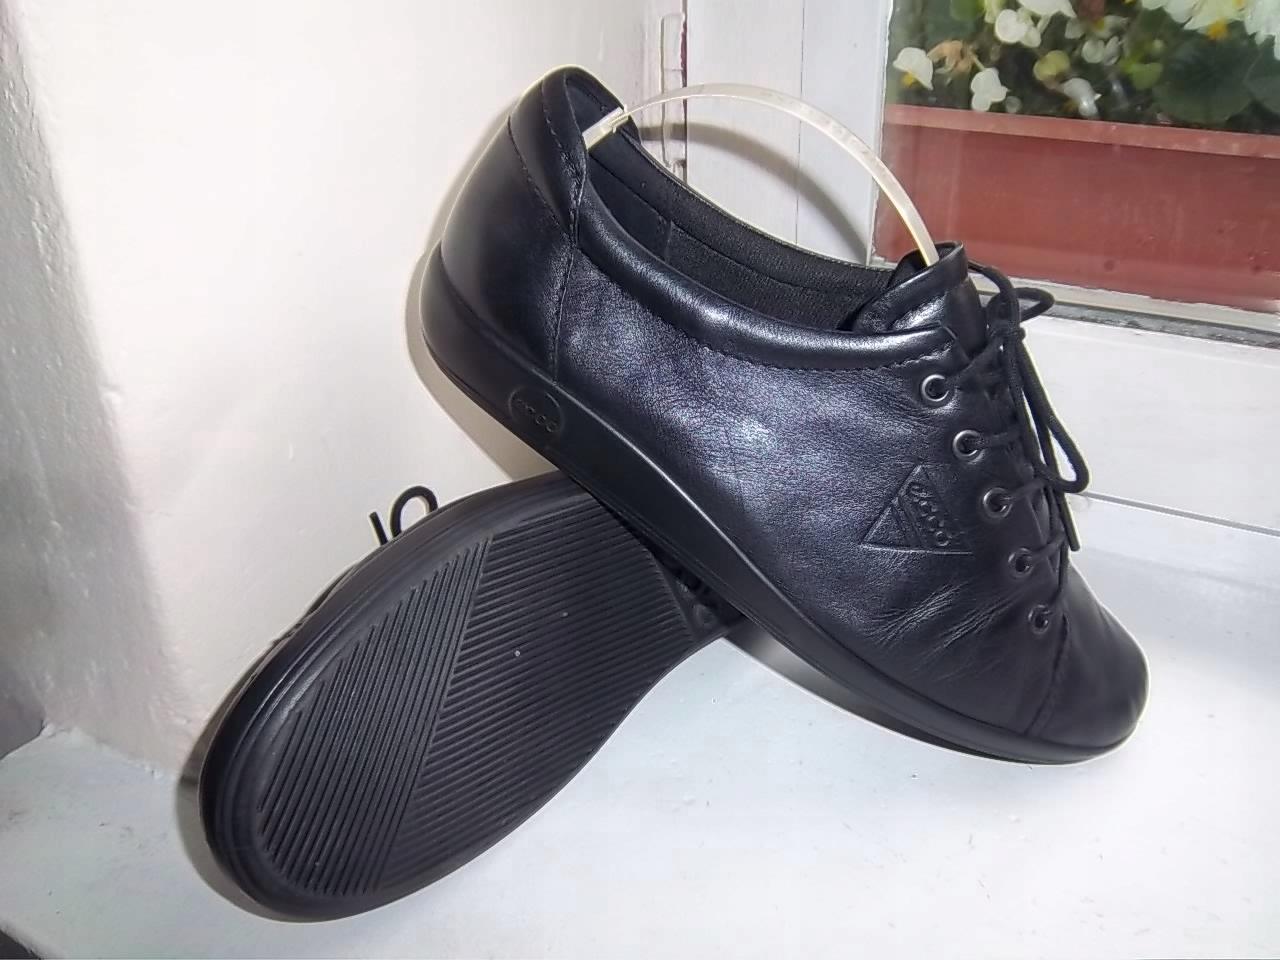 ECCO super buty skórzane r 39 dl.wkł.25cm CZARNE